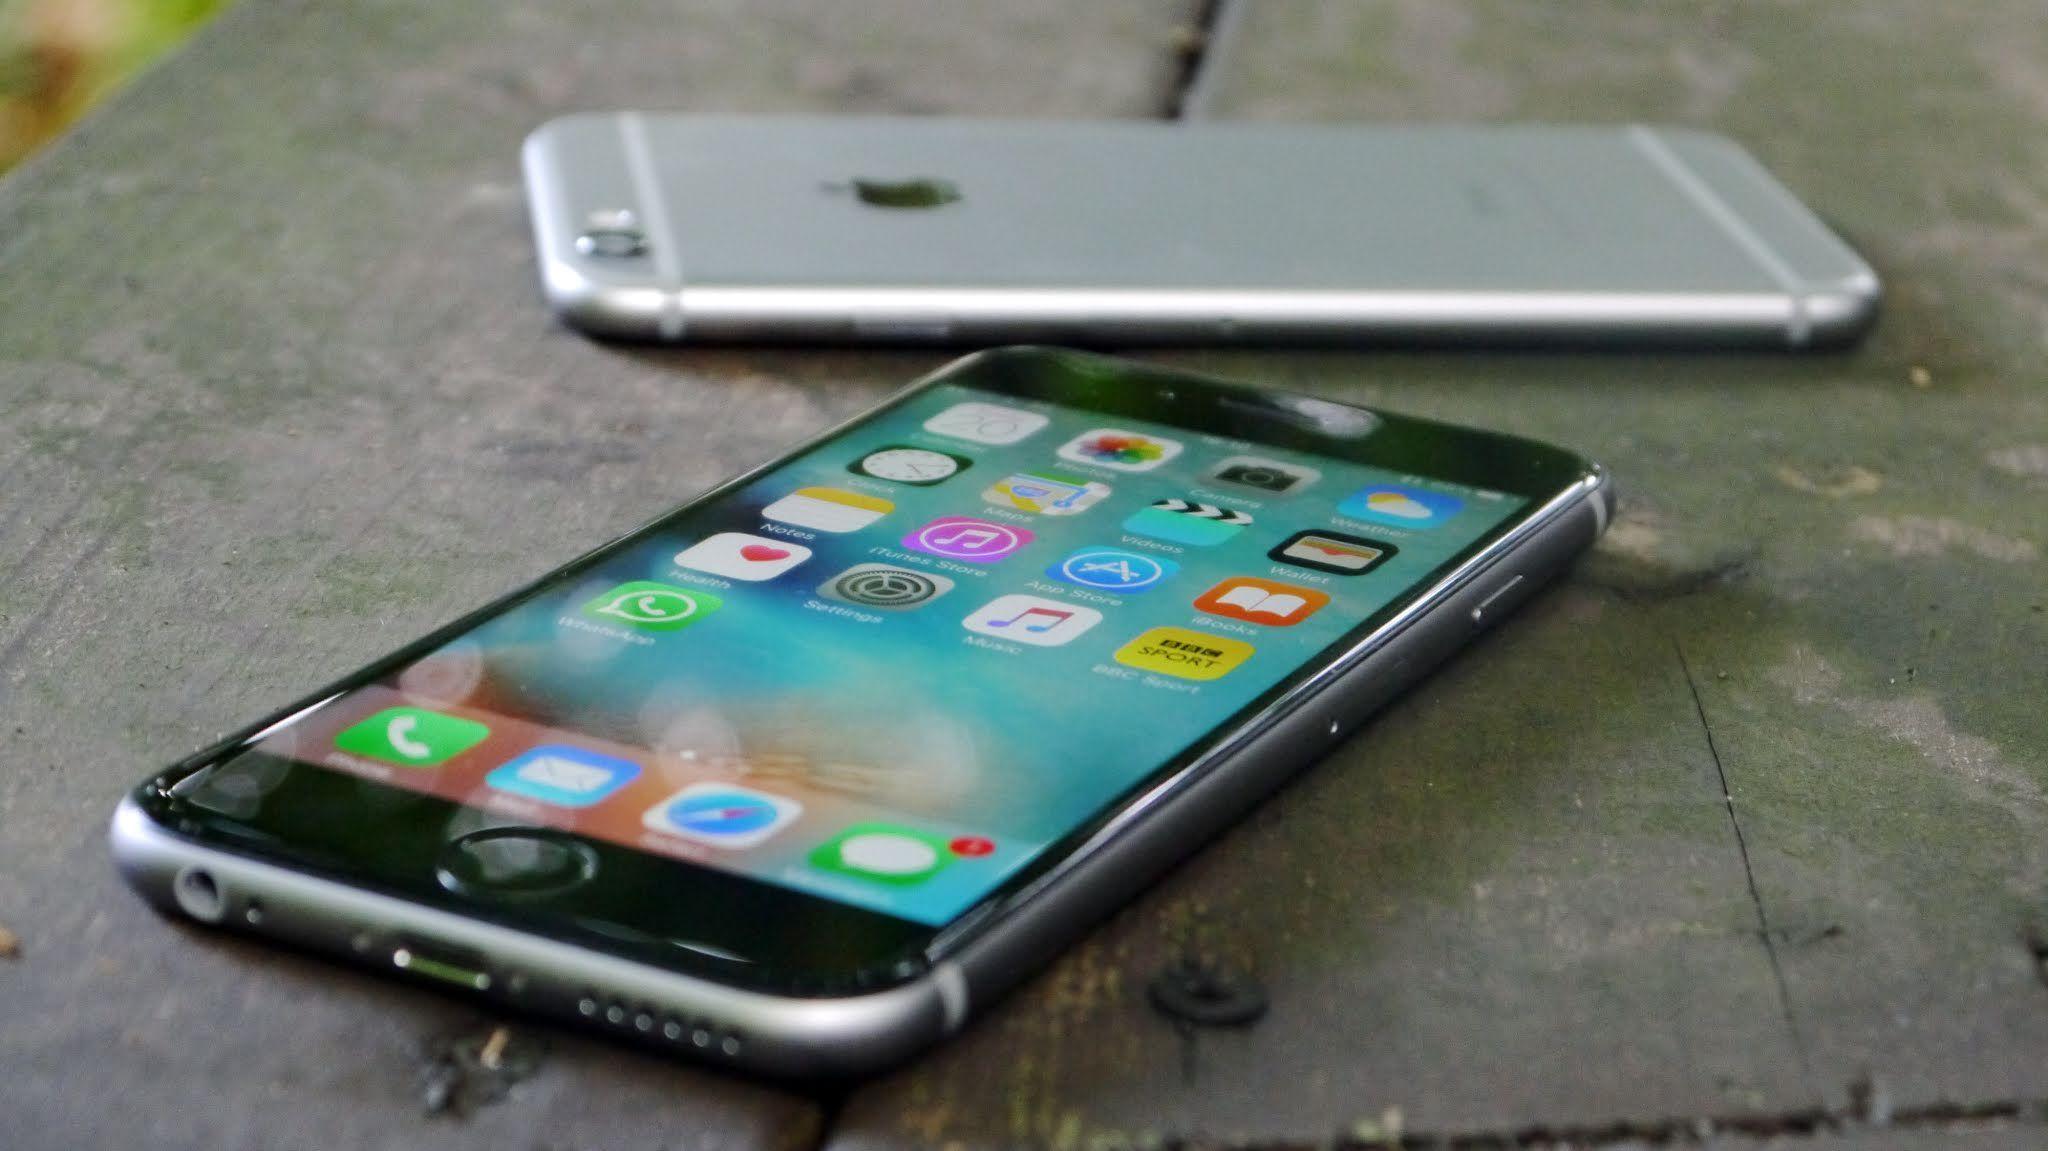 Untitled Iphone, Phone, Iphone hacks